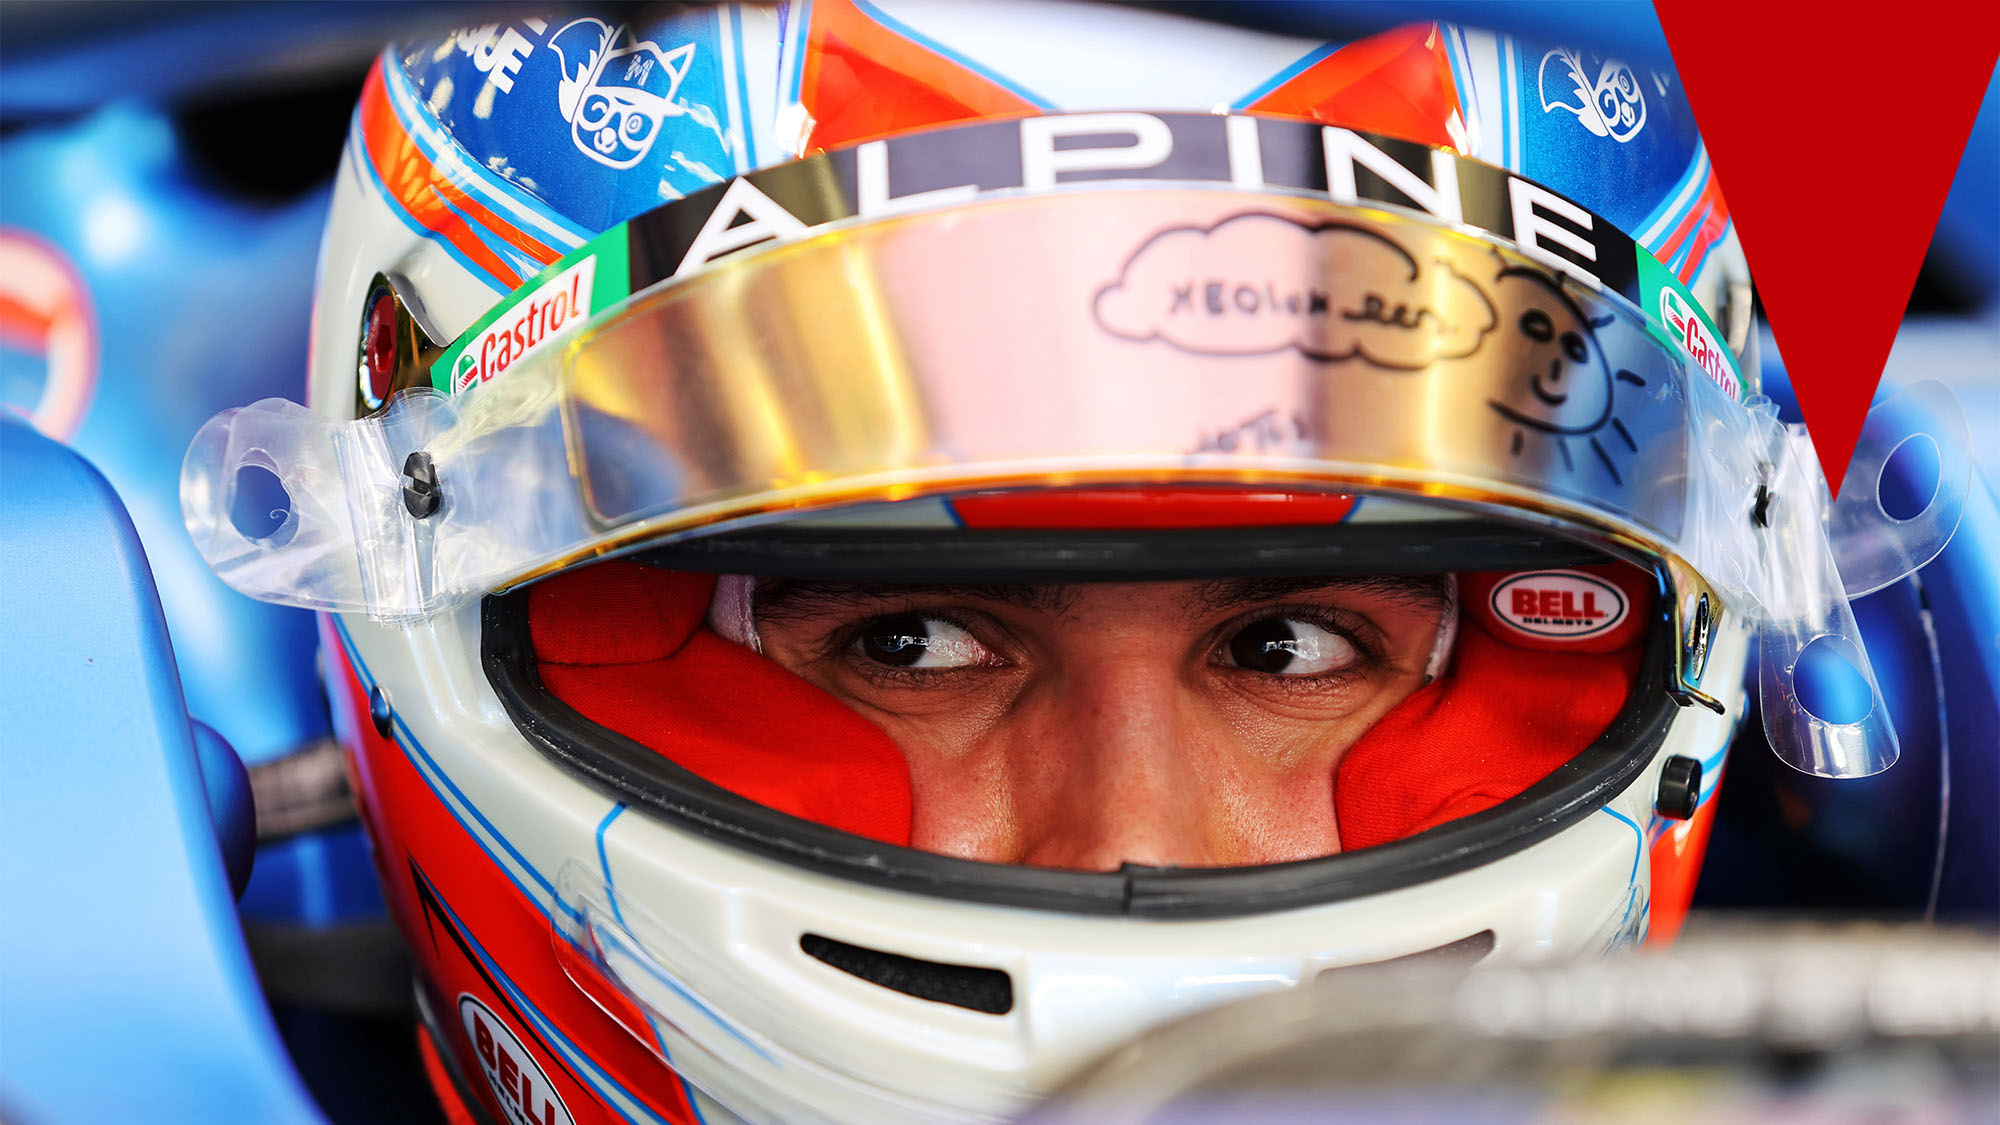 Esteban Ocon (Alpine-Renault) with his helmet on before the 2021 Bahrain Grand Prix. Photo: © Copyright: FIA Pool Image via Grand Prix Photo - for Editorial Use Only